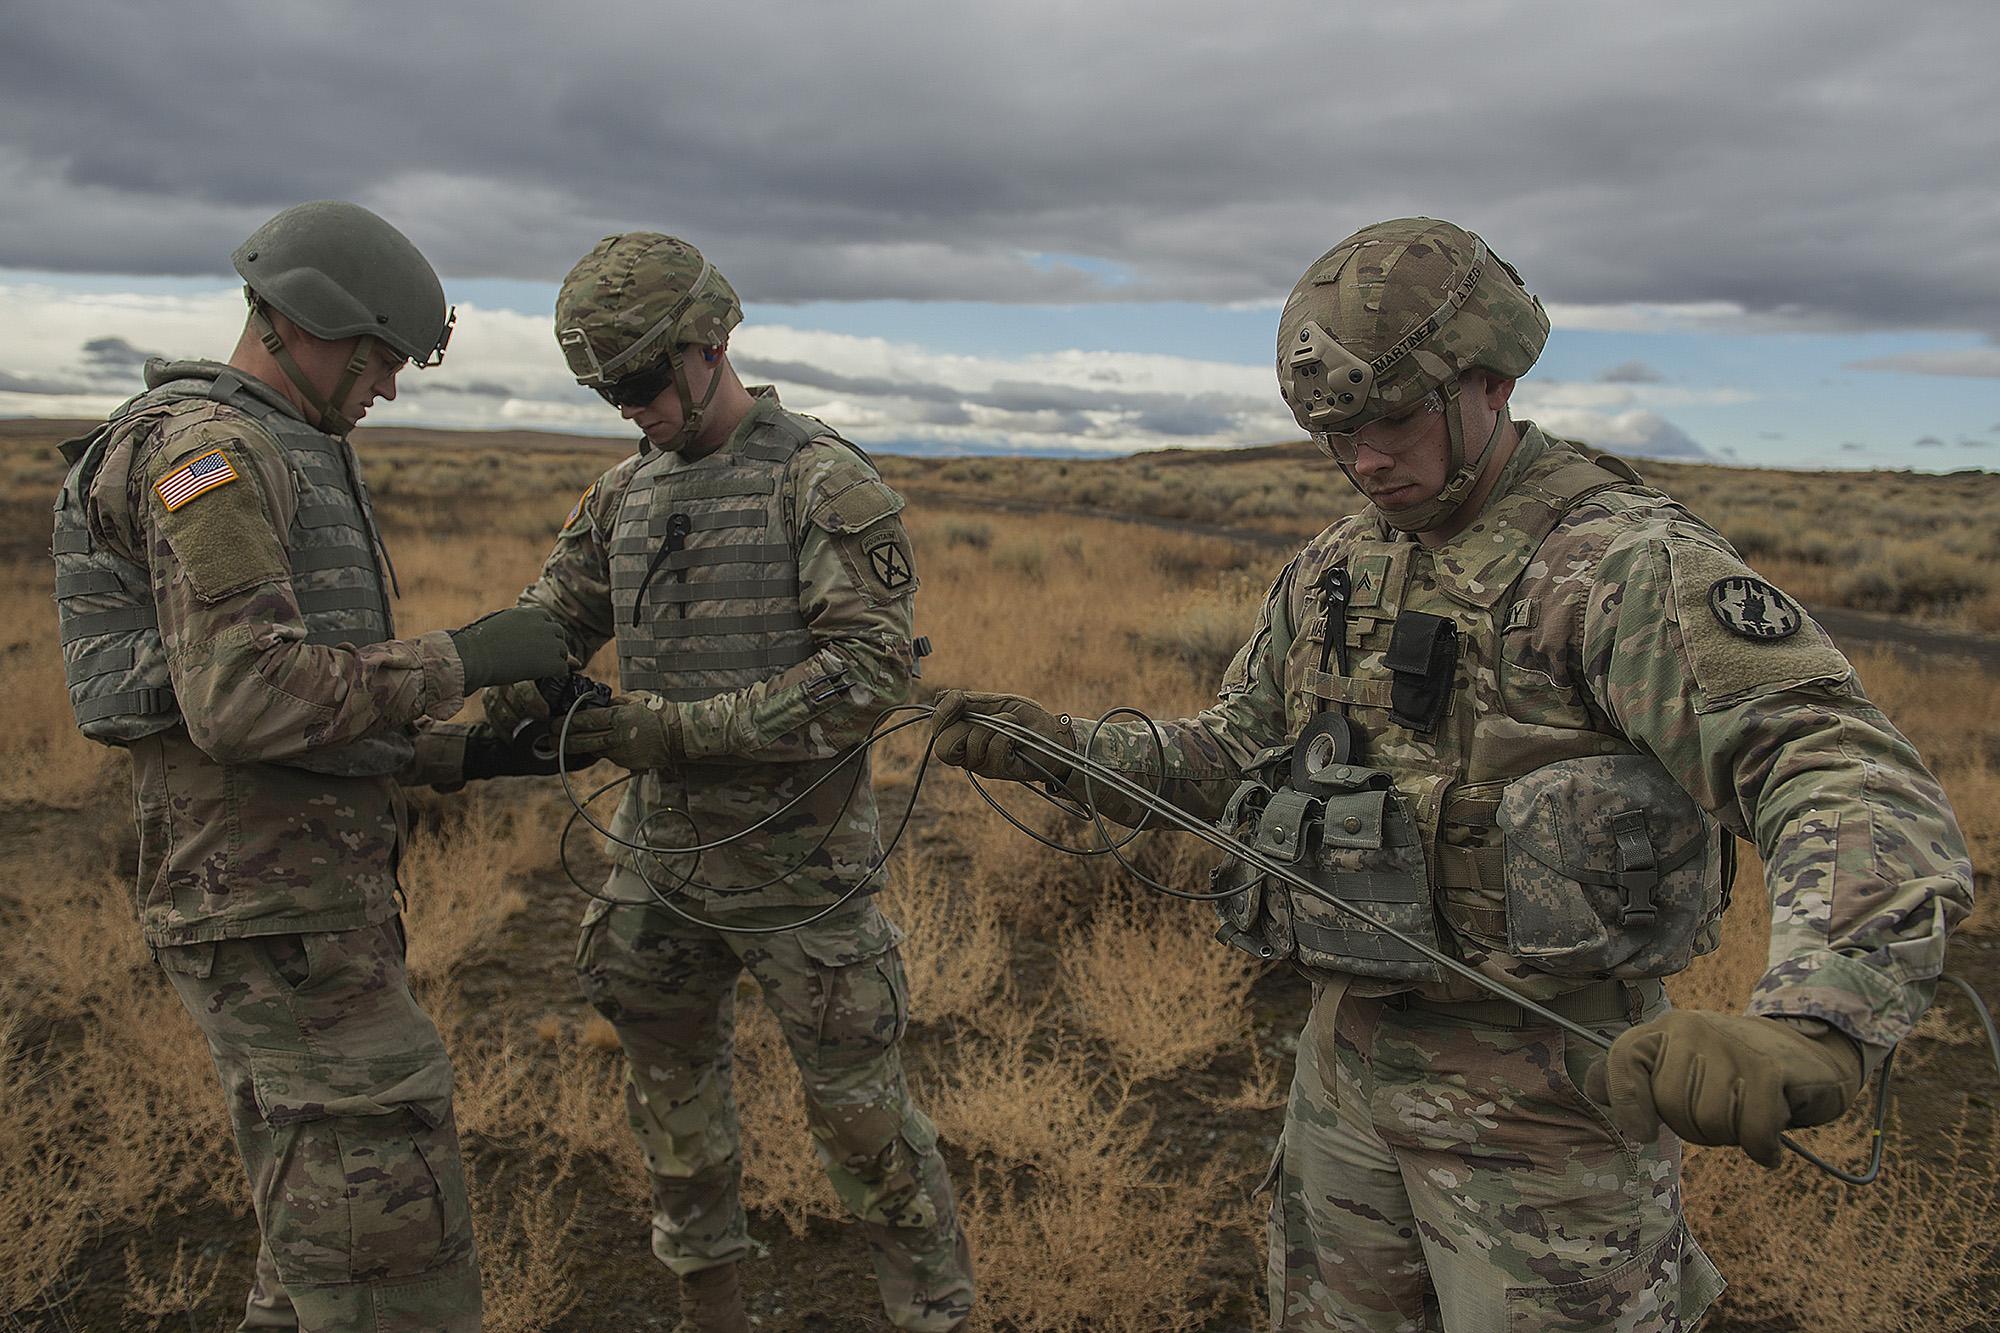 Army Spcs. Timothy Martin, left, and Shane Flores, middle, and Cpl. Dario Martinez prepare for a detonation during training in Boise, Idaho, Nov. 18, 2020. (Thomas Alvarez/Army)